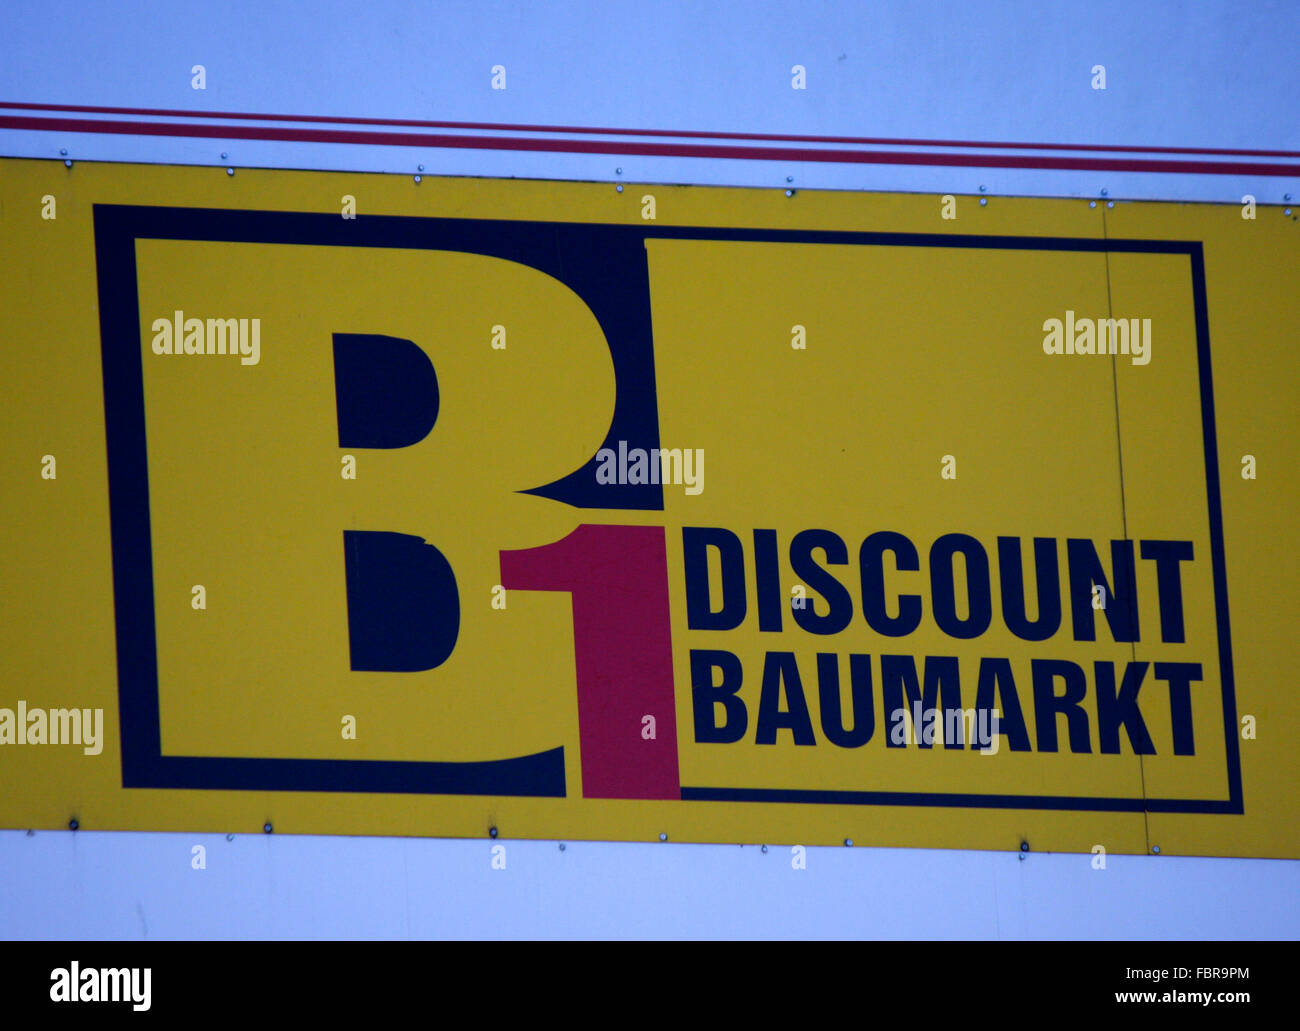 Markenname: 'B1 Discount Baumarkt', Berlin. - Stock Image